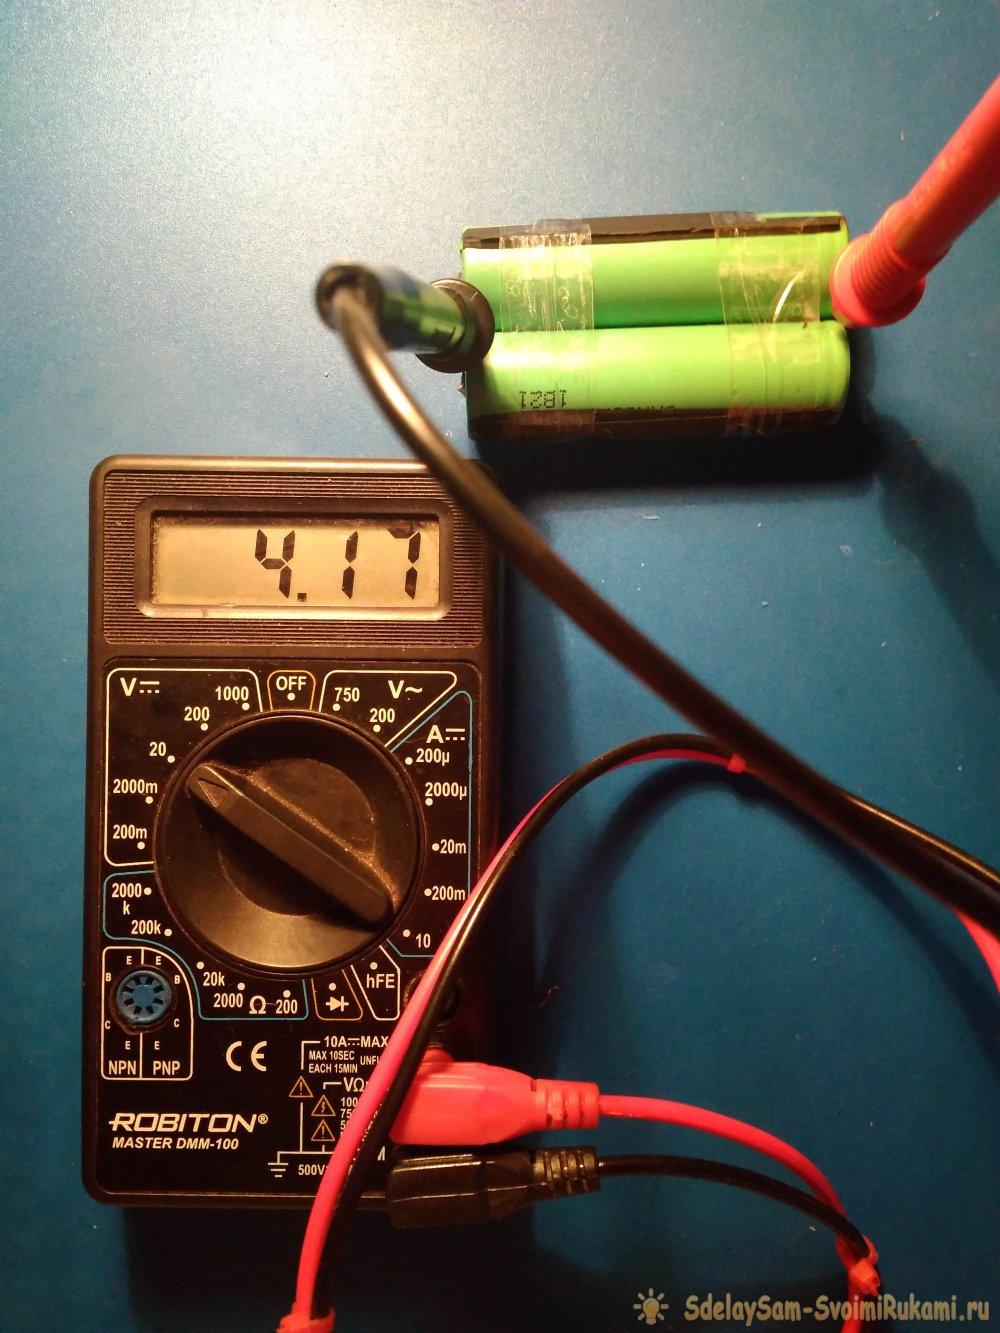 Power bank своими руками из аккумулятора 83